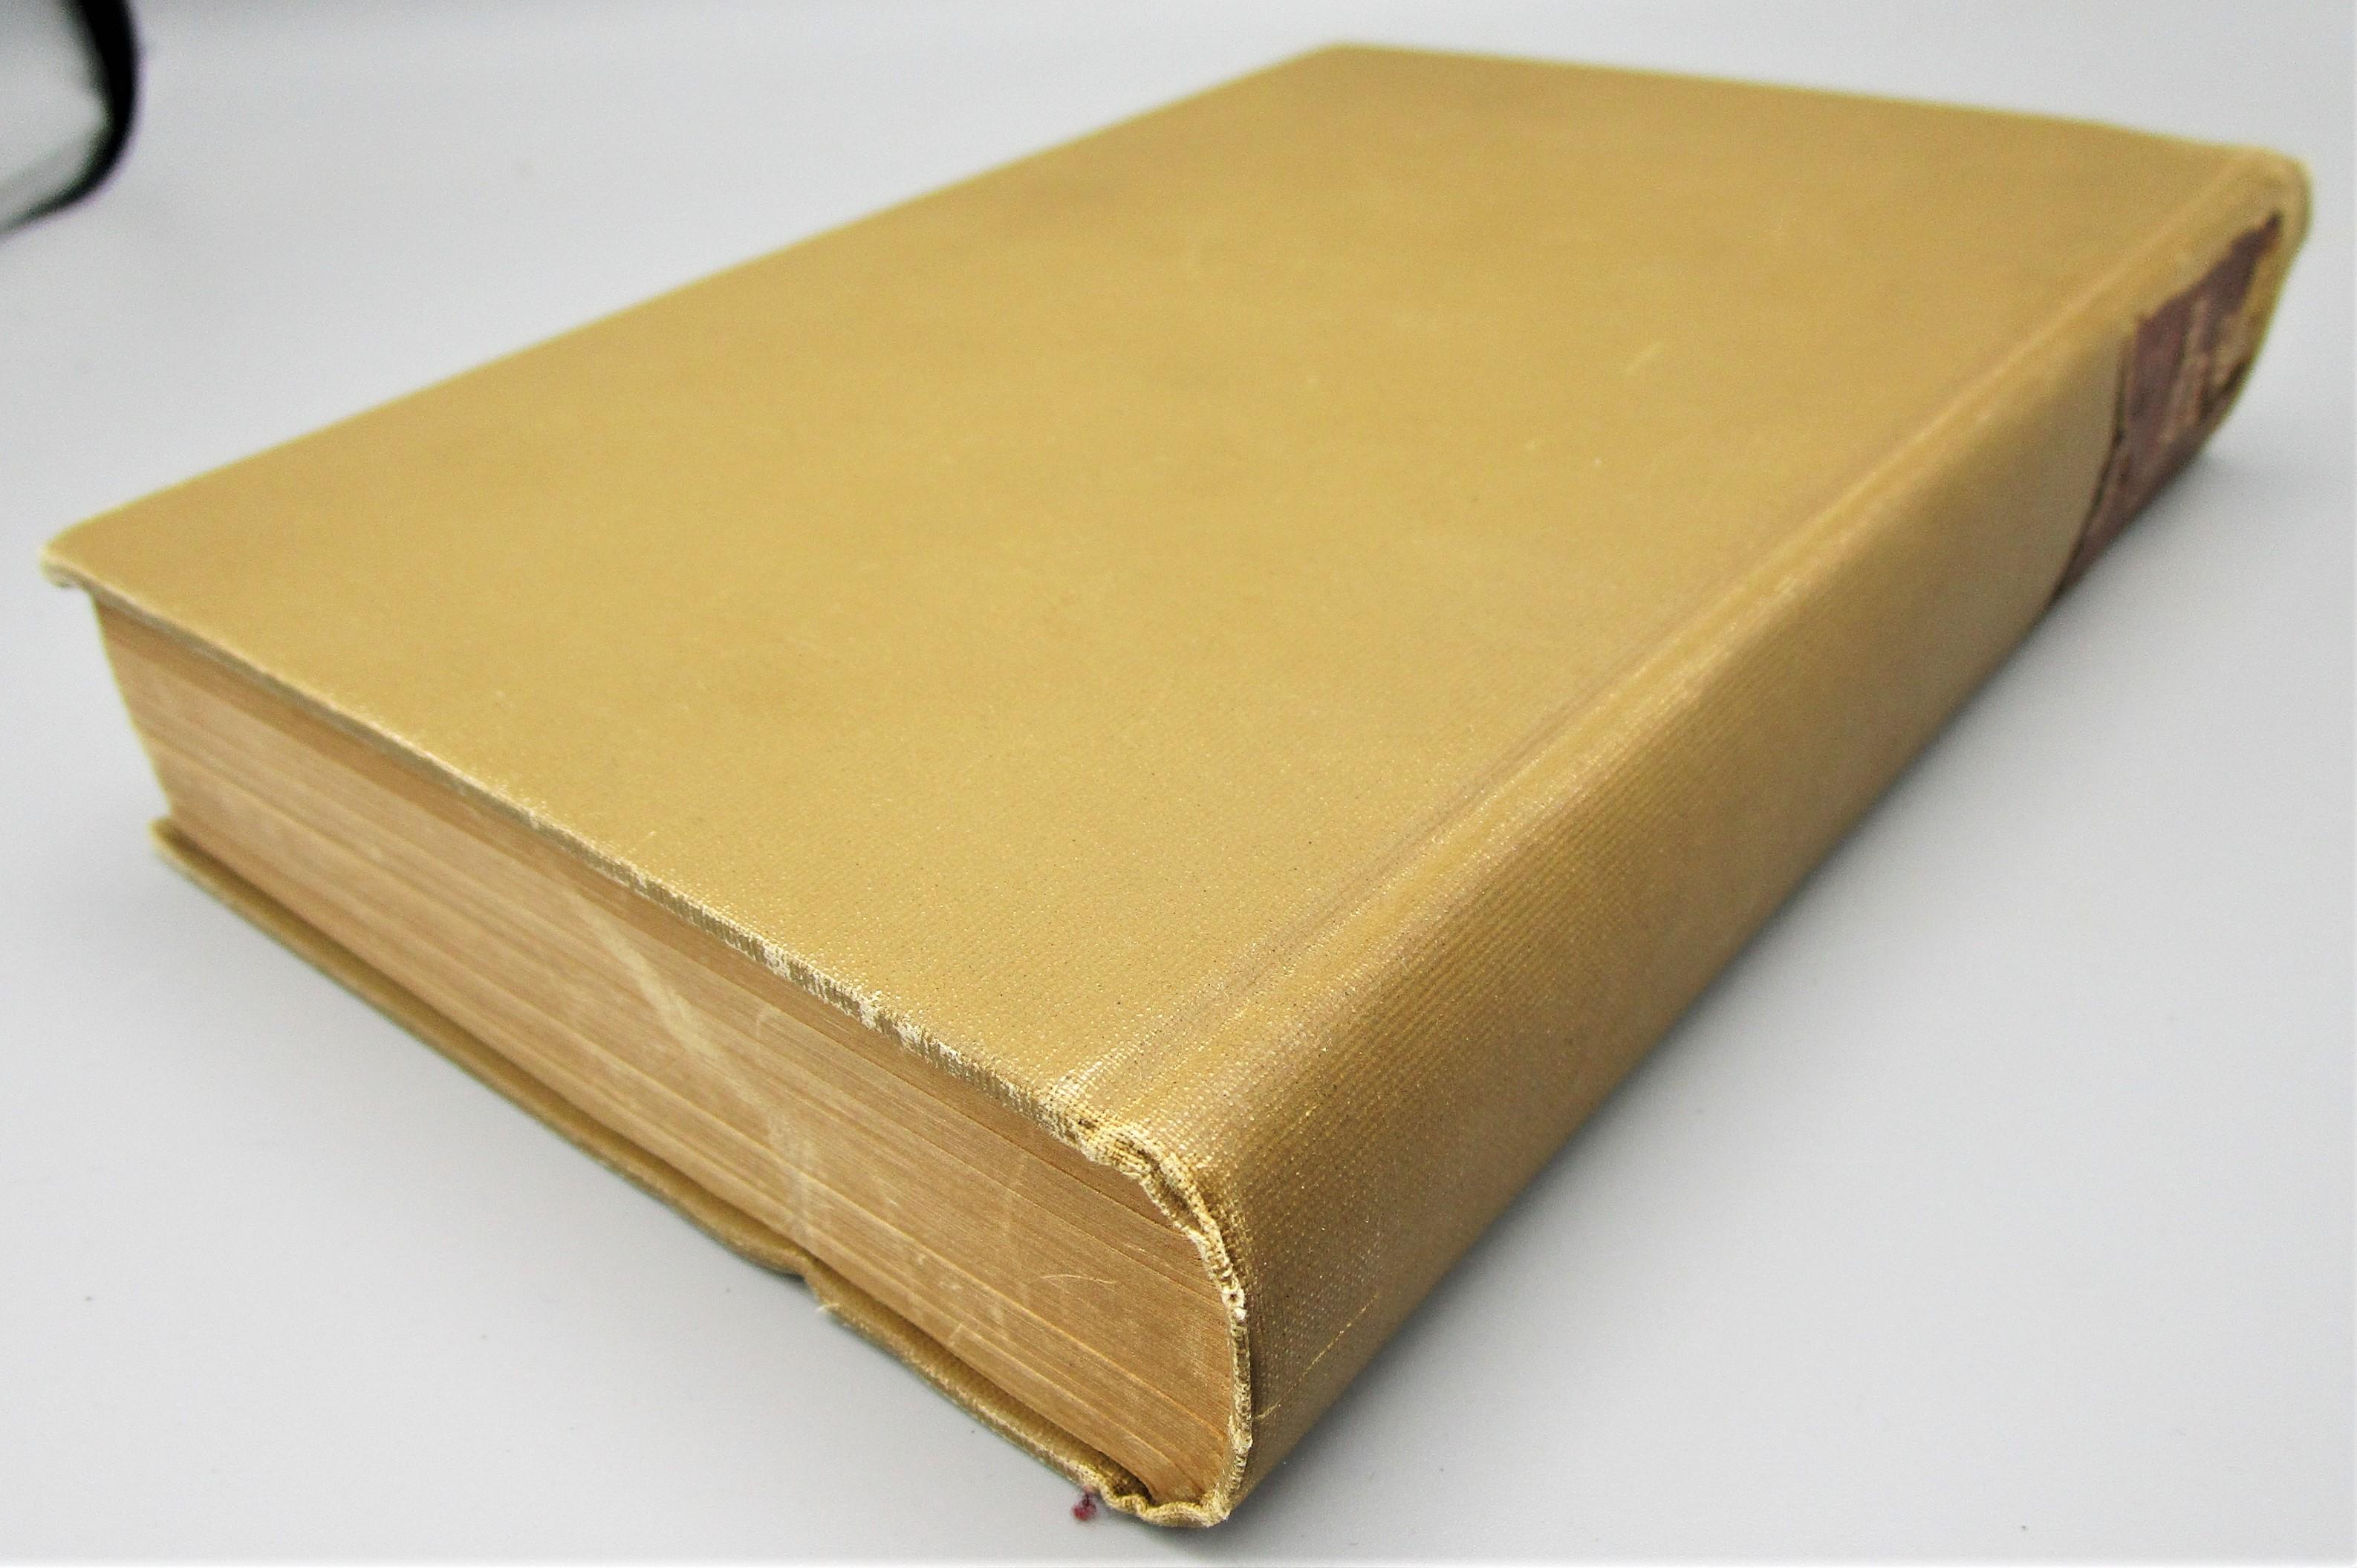 PRIDE AND PREJUDICE, by Jane Austen; illus by C.E. Brock - 1904